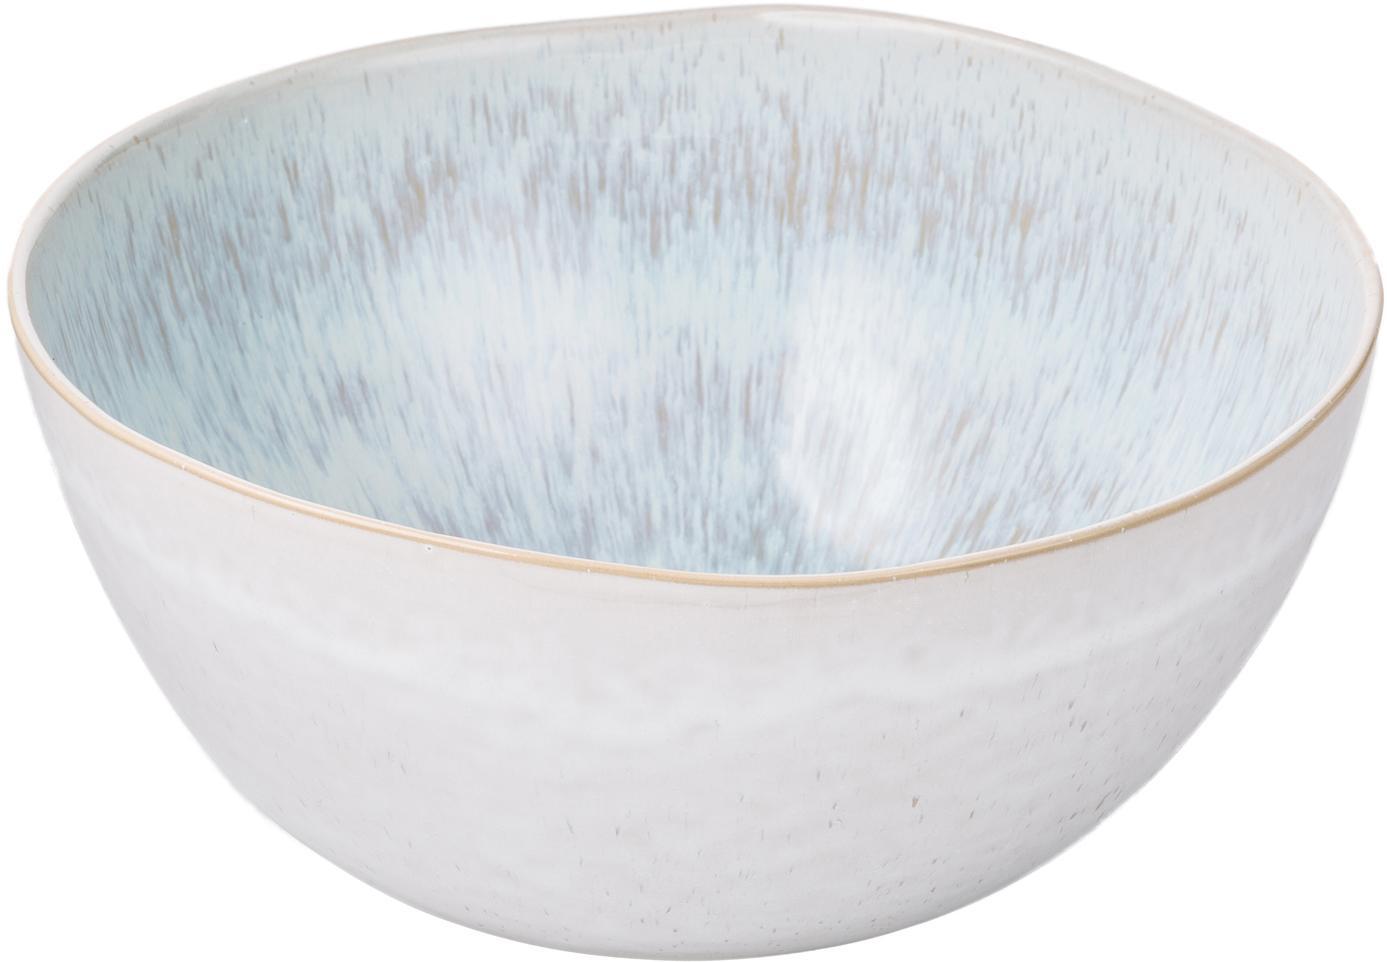 Ensaladera artesanal Areia, Gres, Azul claro, blanco crudo, beige claro, Ø 26 x Al 12 cm